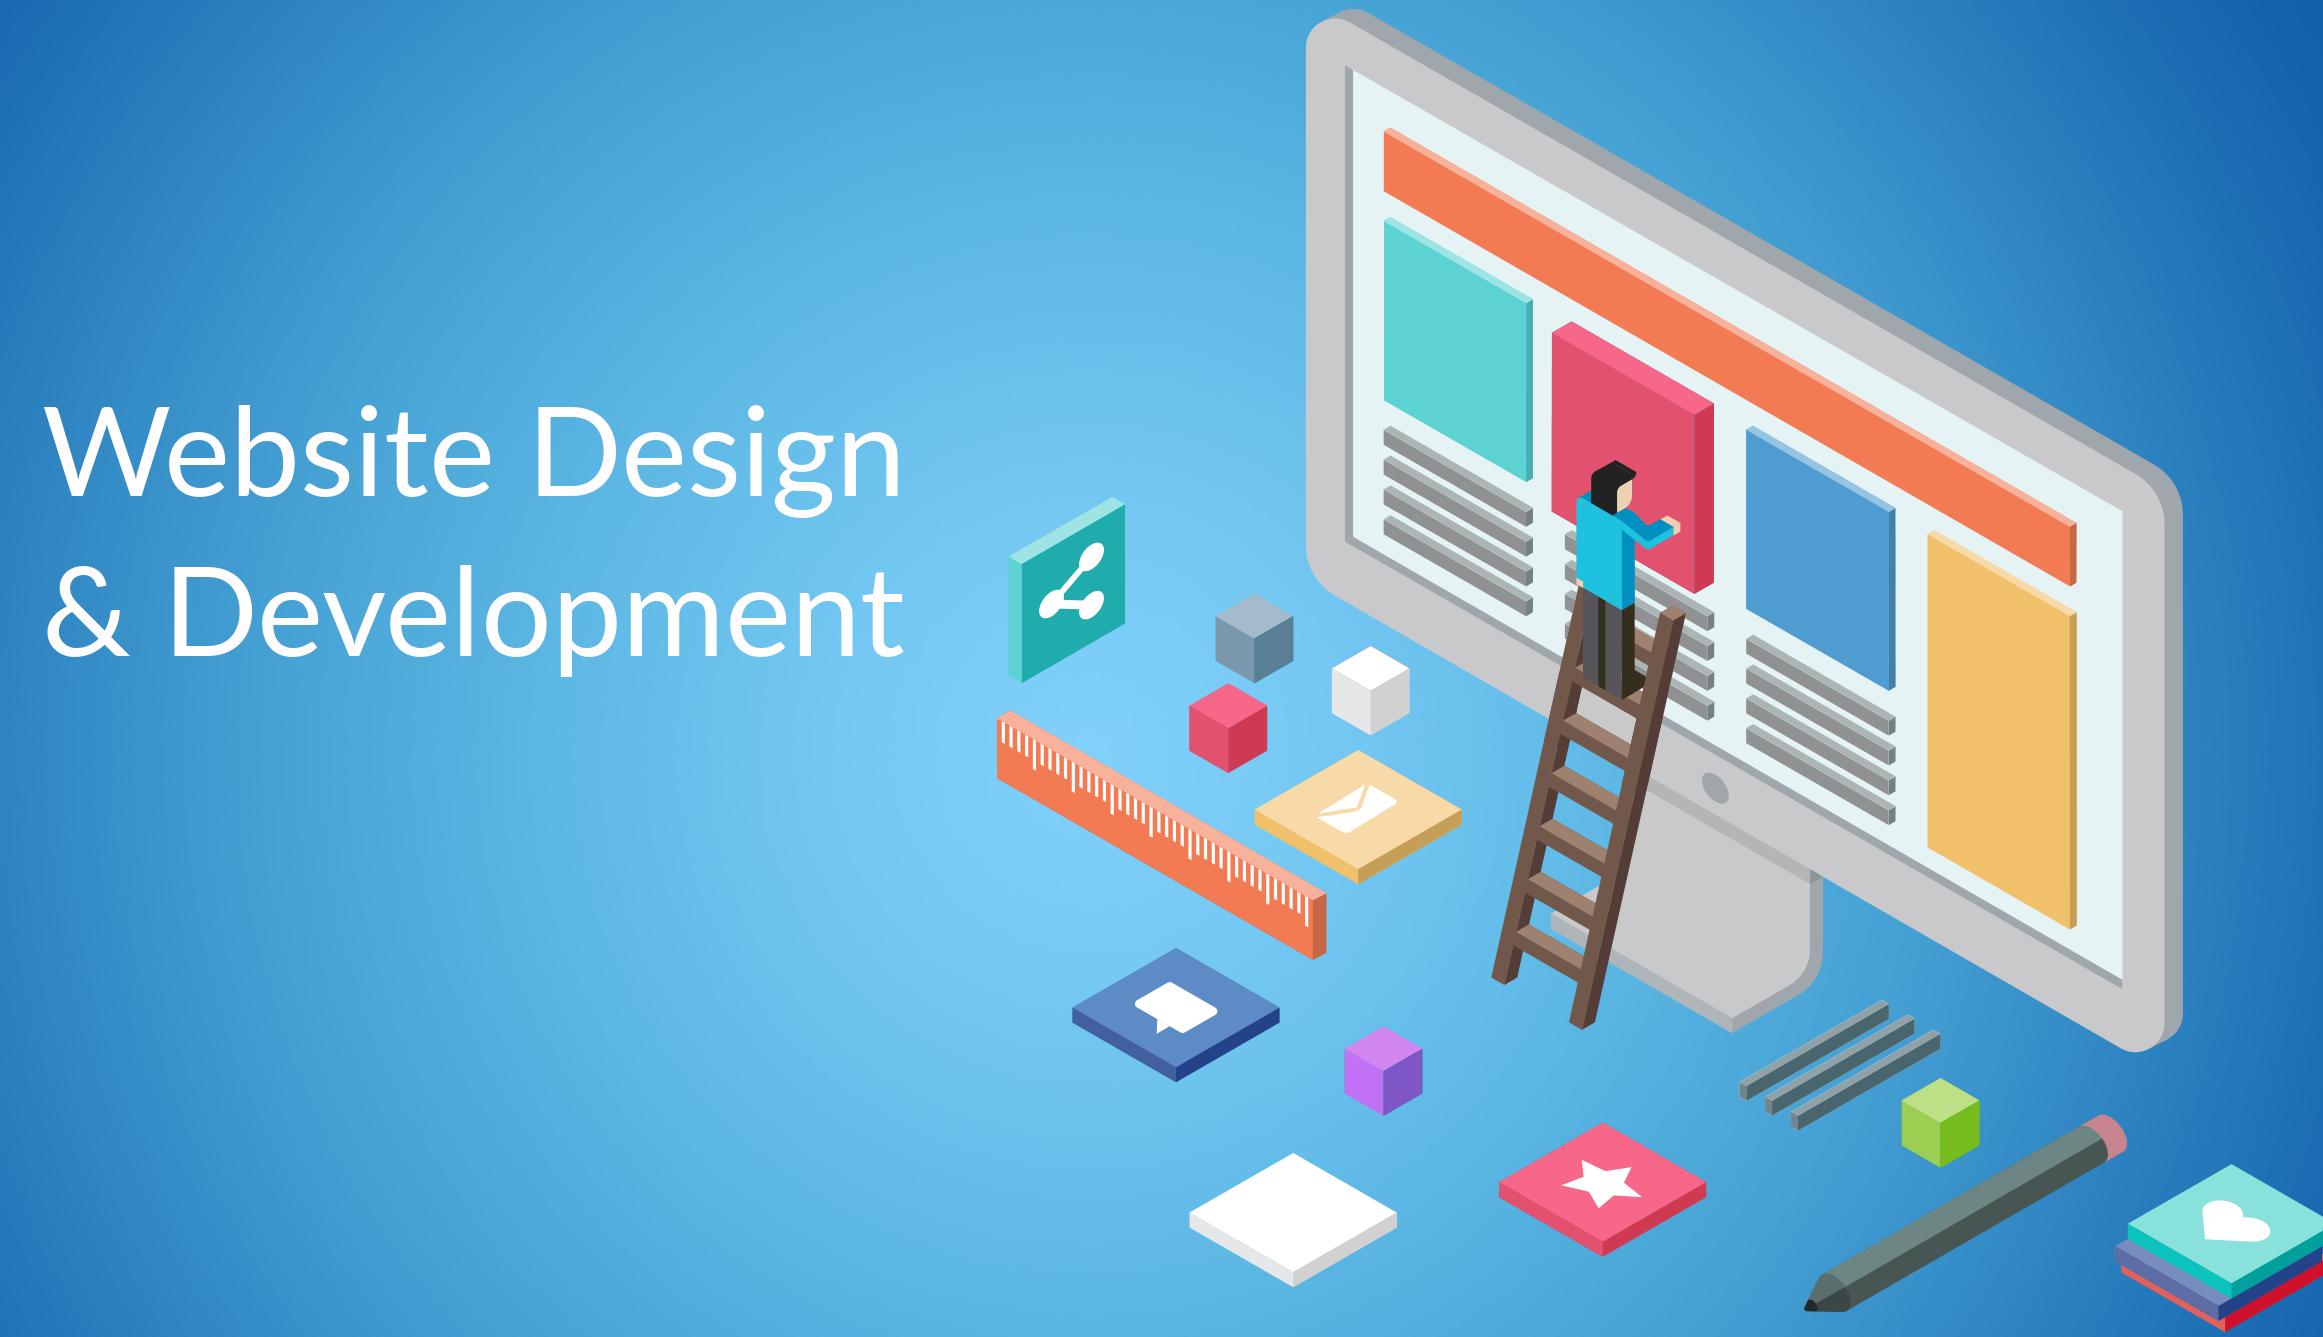 Technologies and Methodologies Used in Website Design